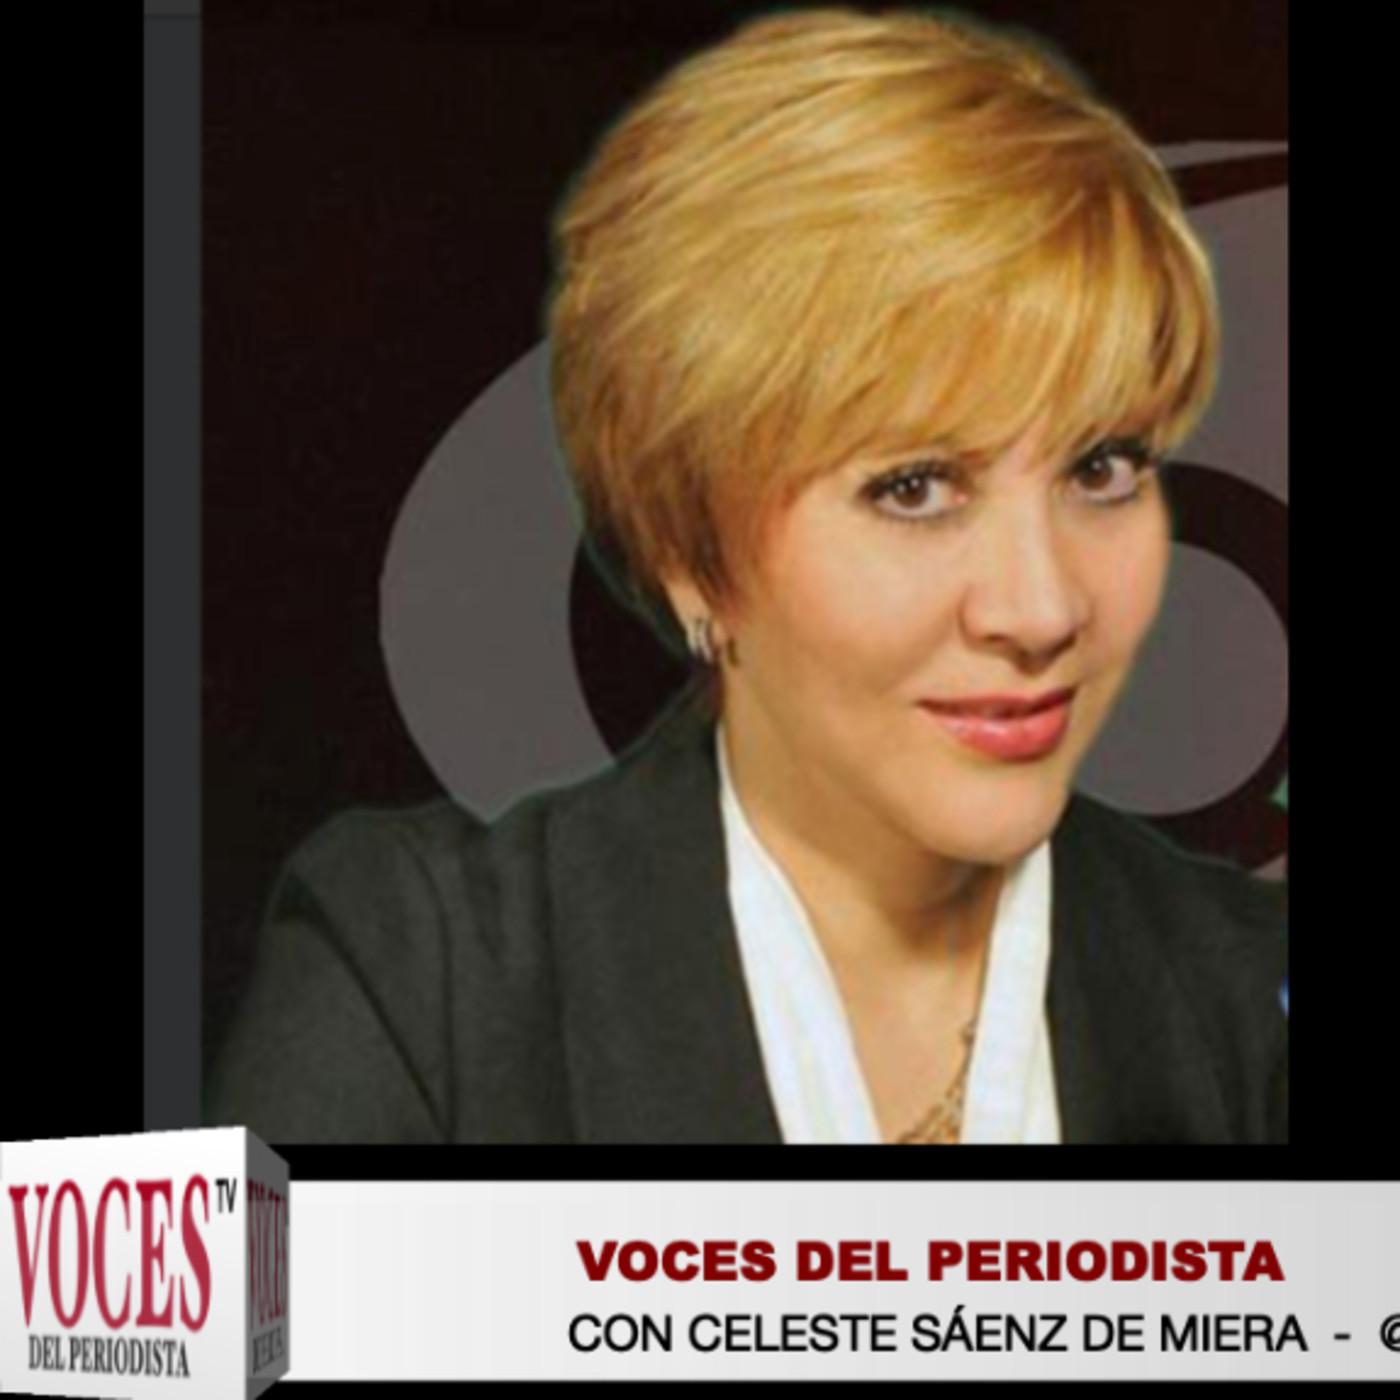 VocesDelPeriodista con @CelesteSaenzM @jbautista0071 - 22 de Julio